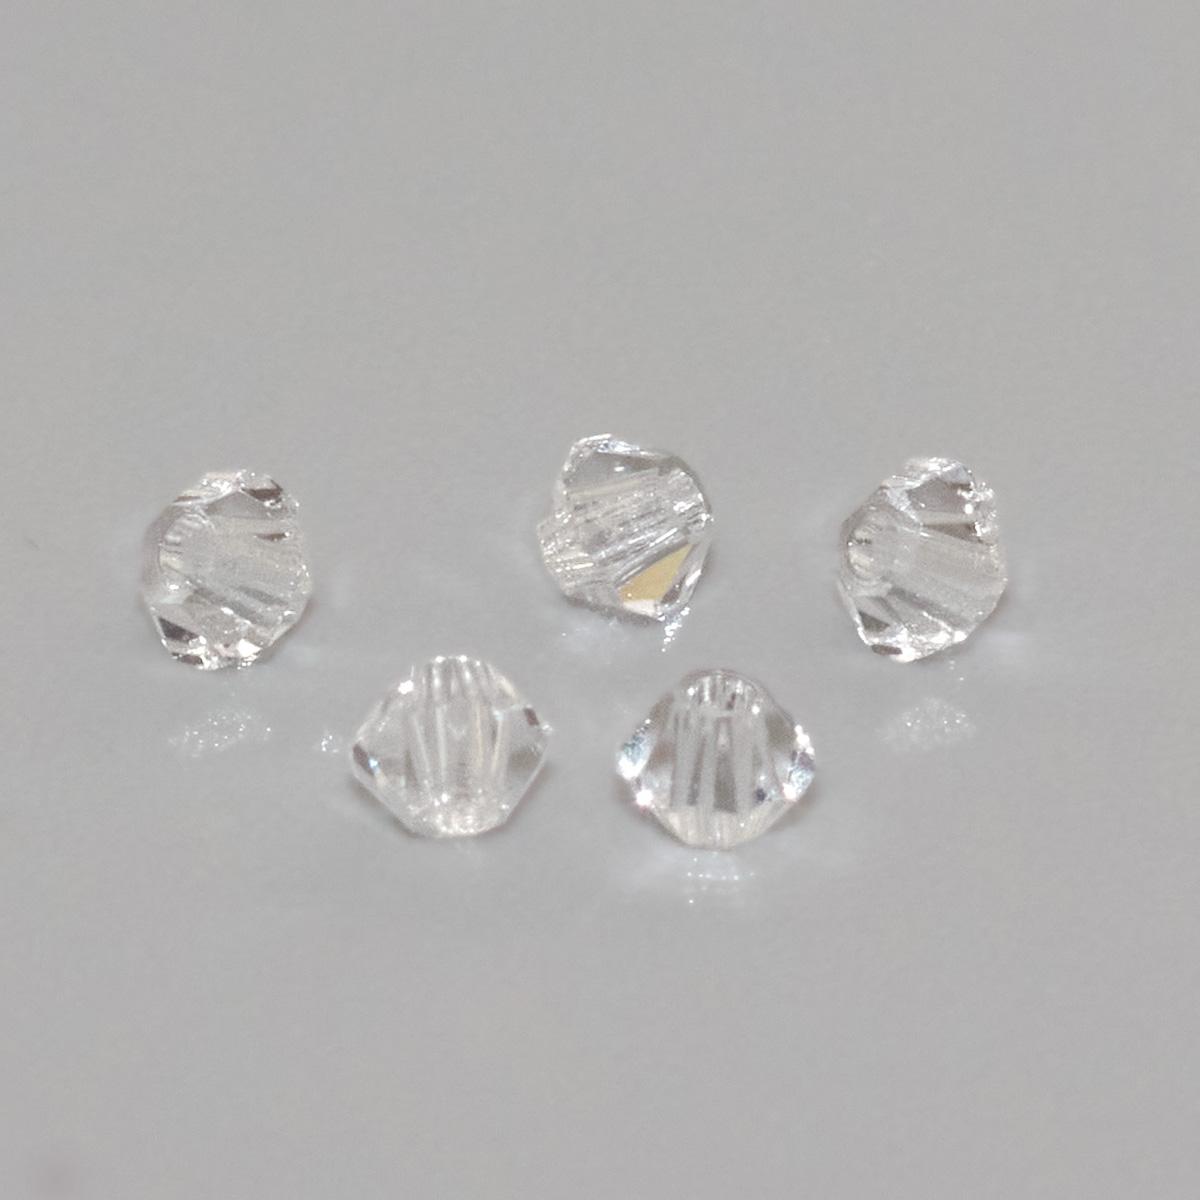 451-69-302 Бусины Биконус Crystal 2,4x3мм. 50 шт. Preciosa